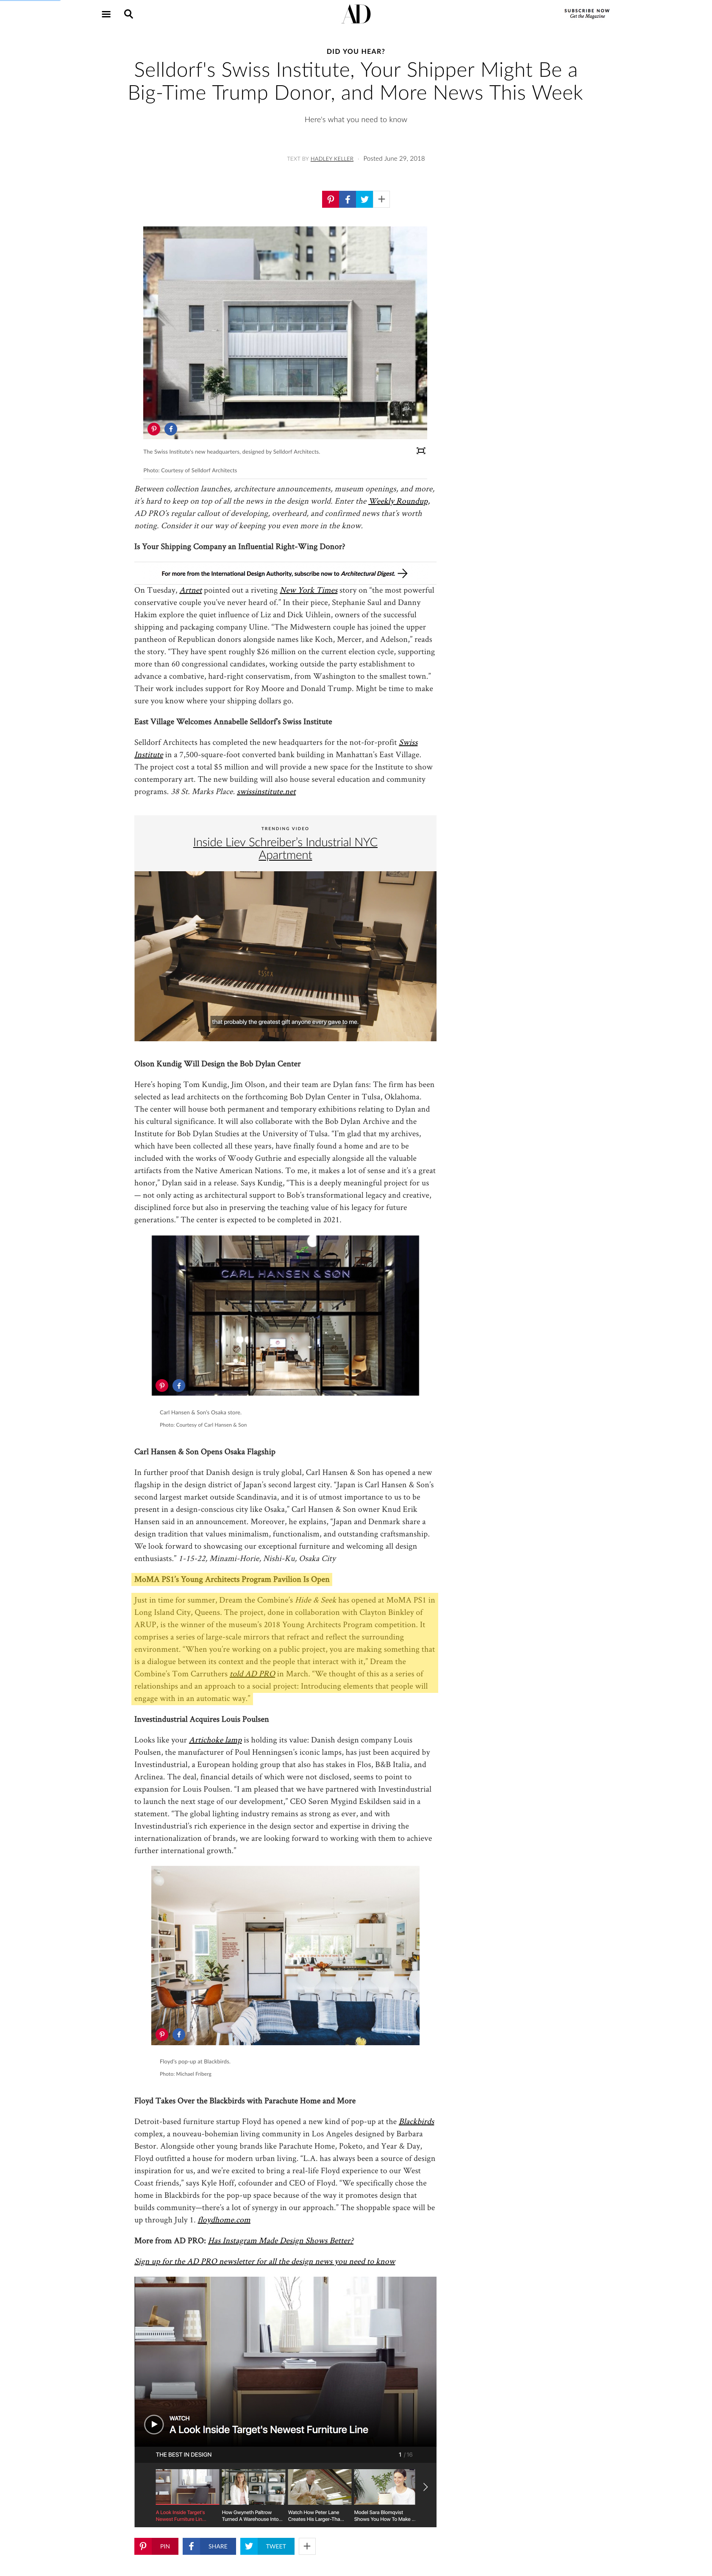 2018 June_Architectural Digest_highlighter.jpg